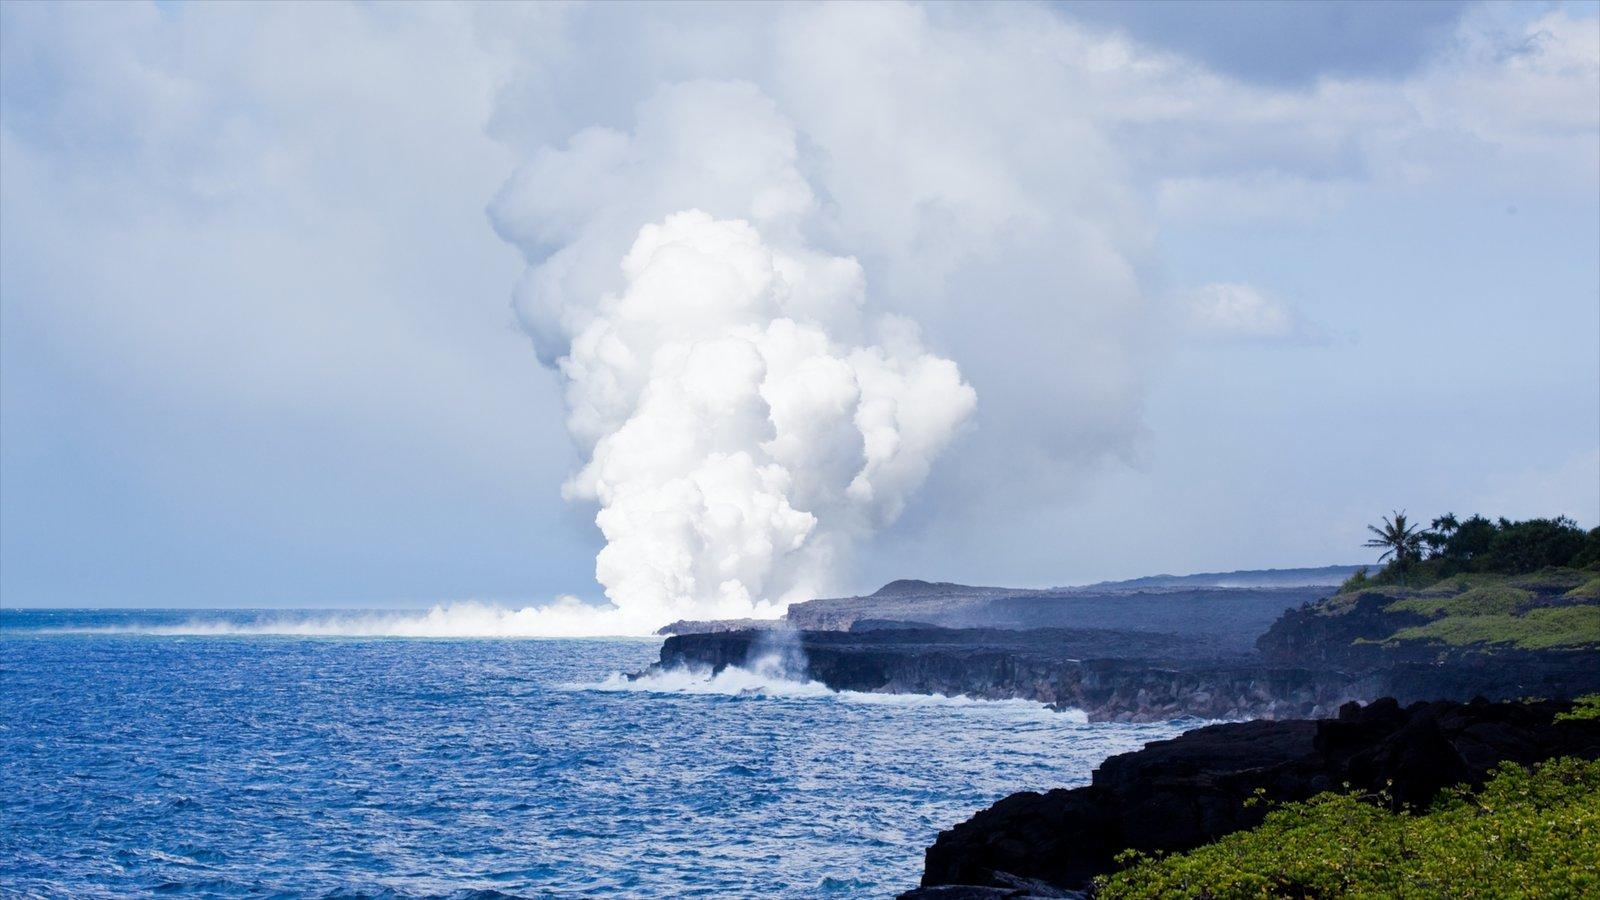 Hawaii Volcanoes National Park caracterizando paisagens litorâneas e paisagem